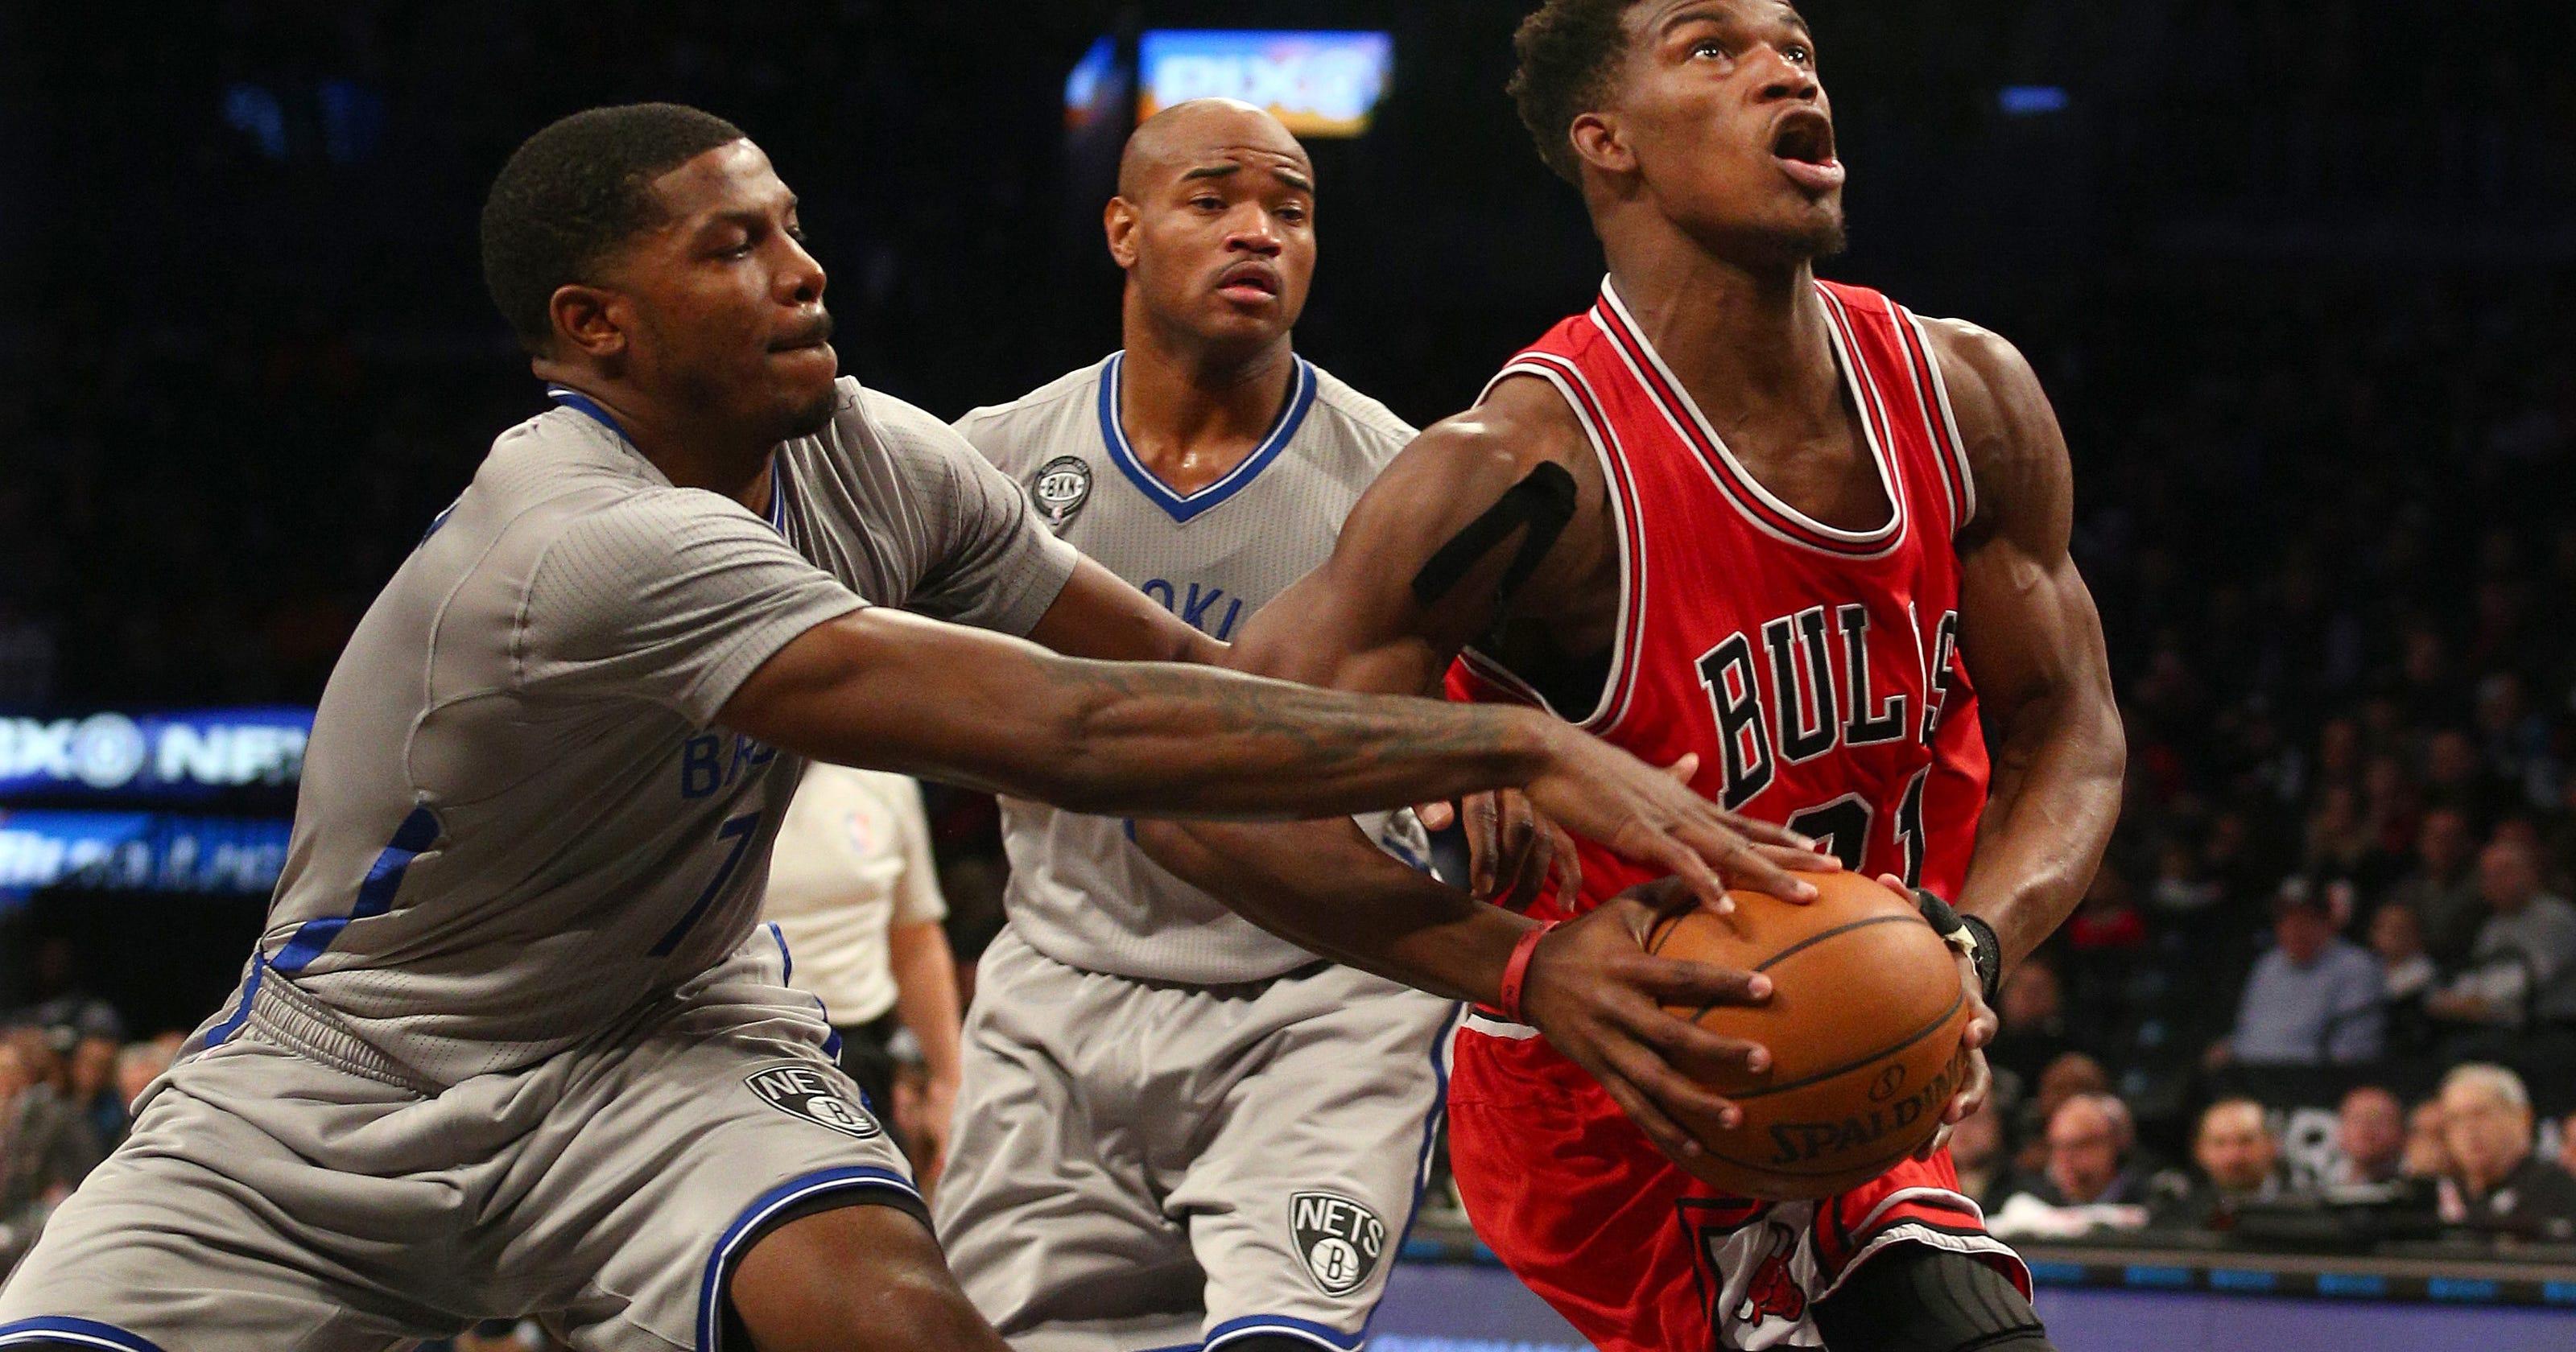 d1cab4b330f Brooklyn Nets lose to Chicago Bulls